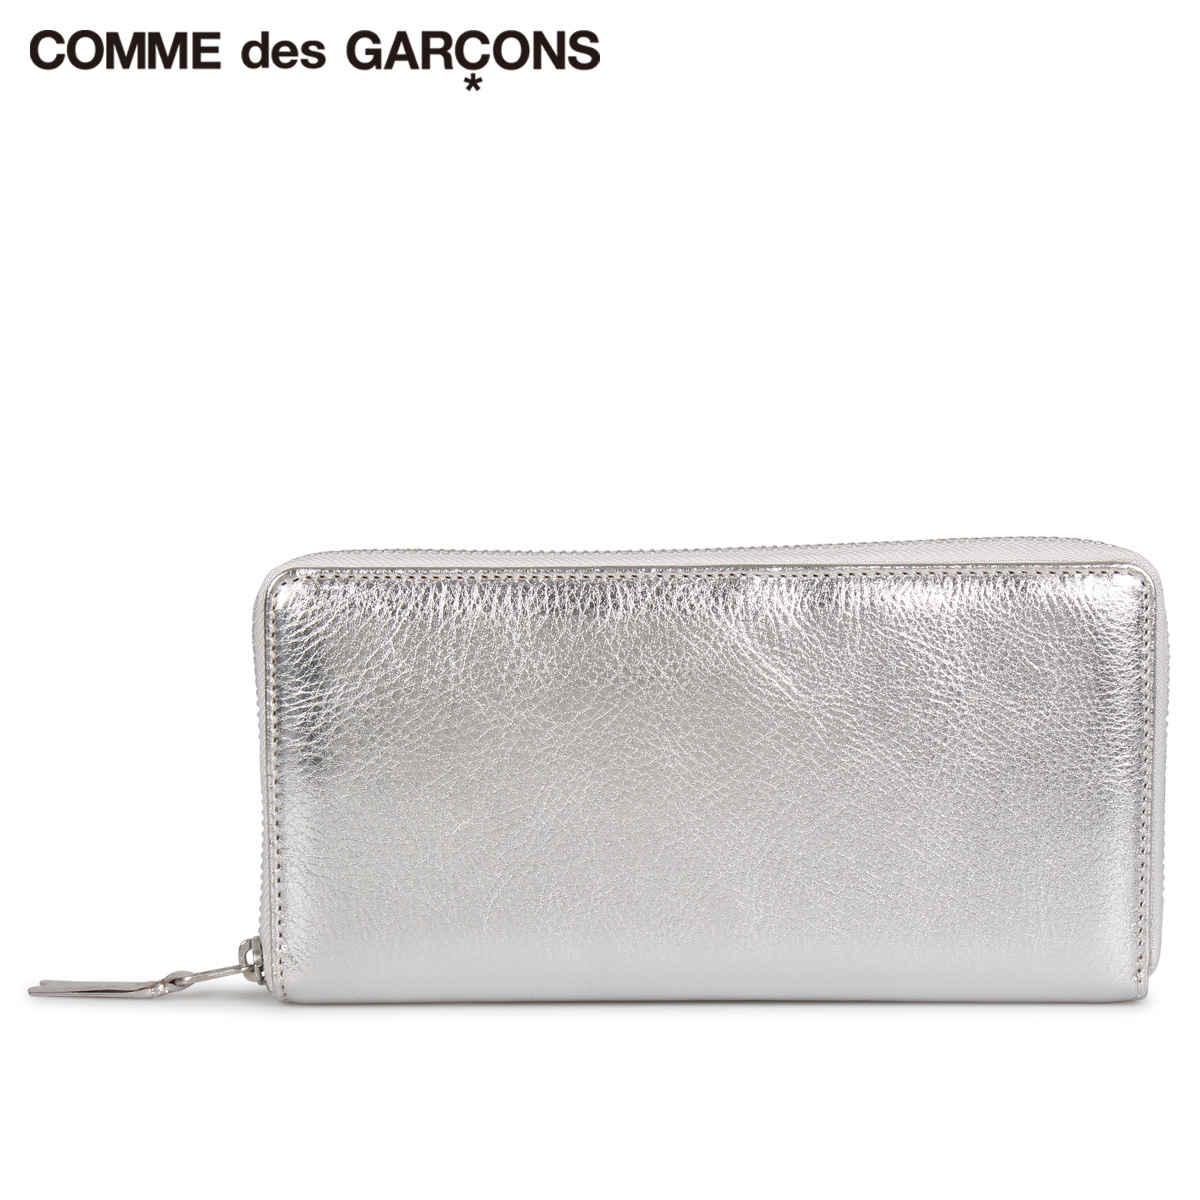 COMME des GARCONS GOLD AND SILVER WALLET コムデギャルソン 財布 長財布 メンズ レディース ラウンドファスナー 本革 シルバー SA0110G